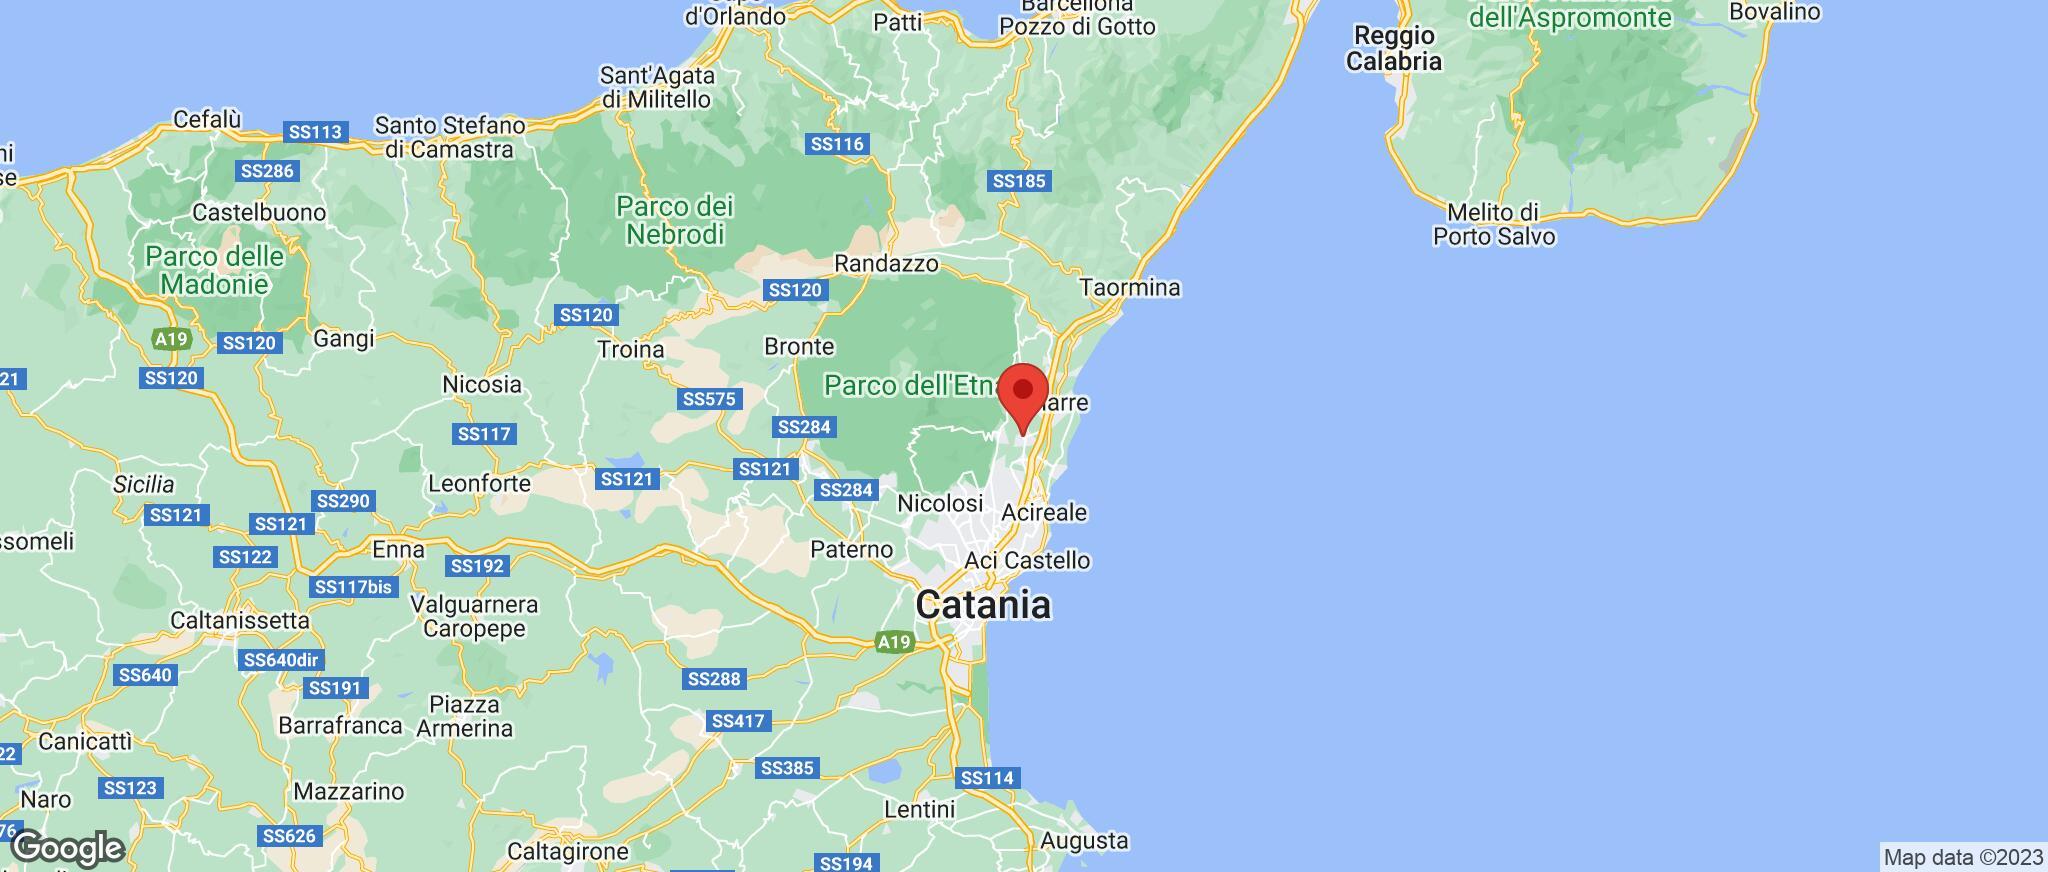 Map showing the location of Santa Venerina